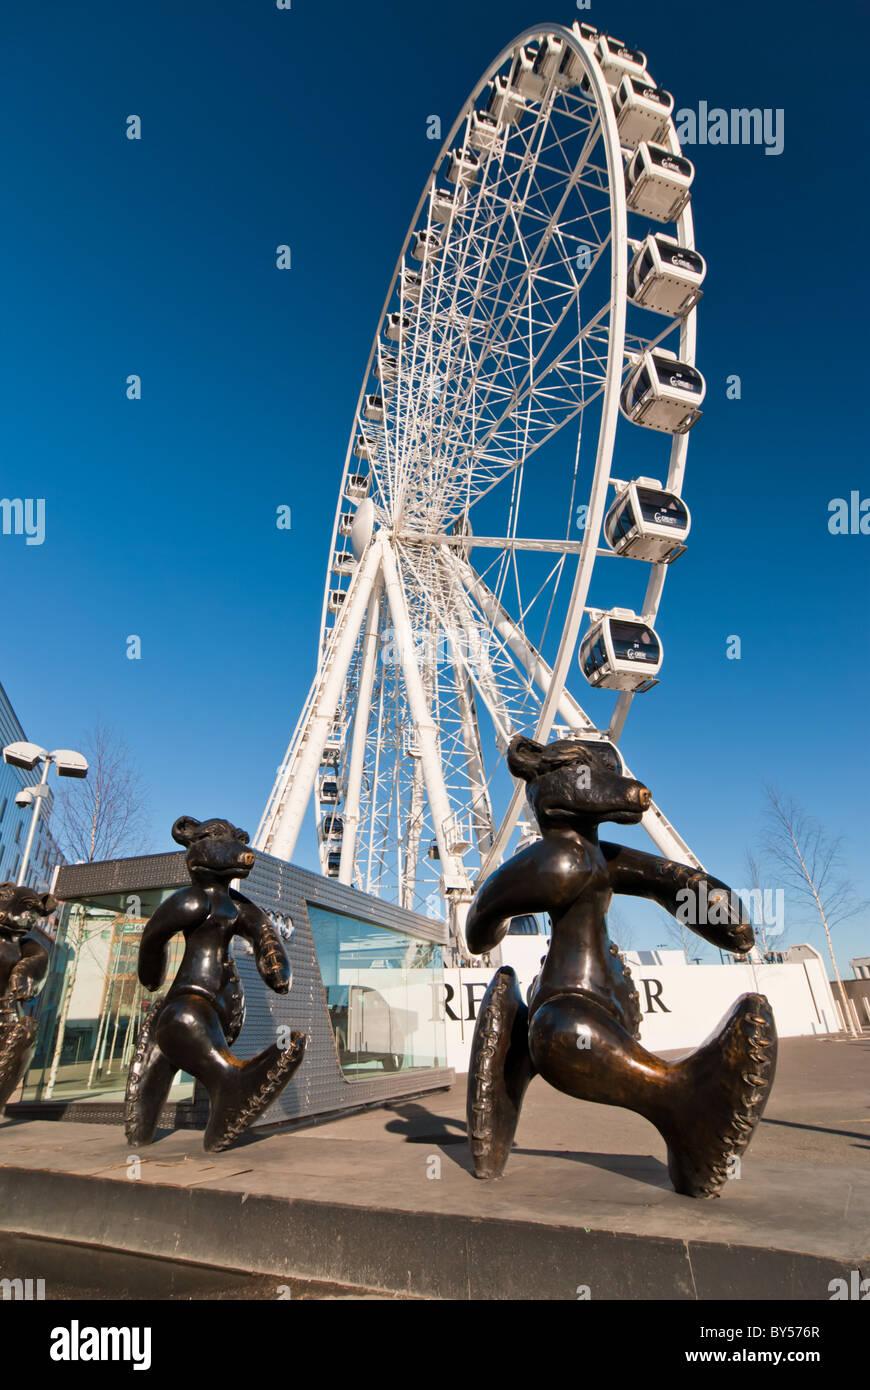 The Dublin Wheel at the Point Village, Dublin, Ireland. - Stock Image